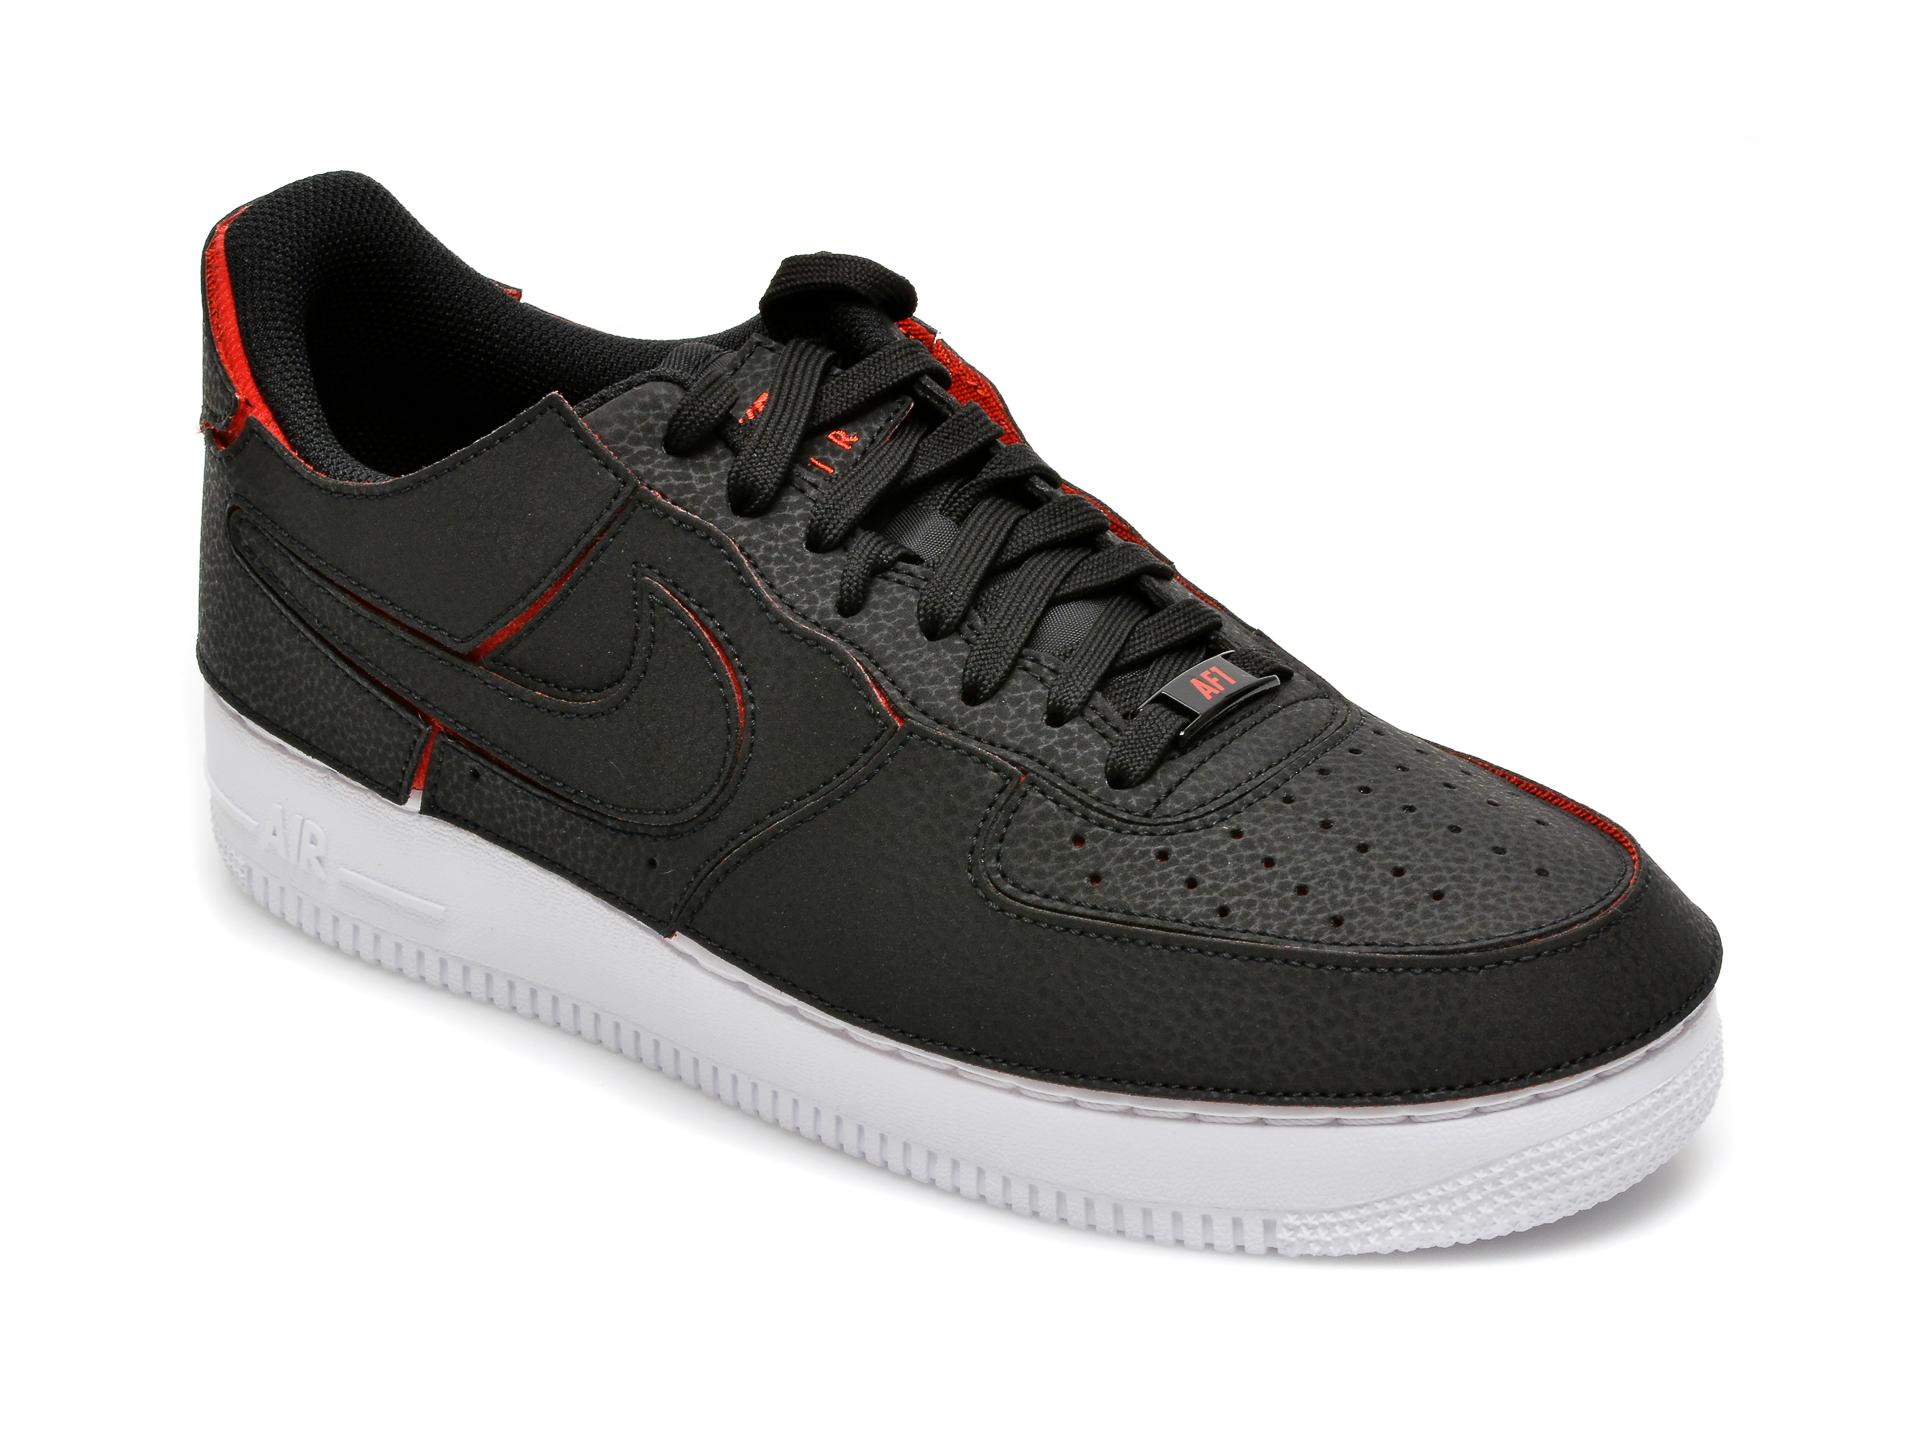 Pantofi sport NIKE negri, Nike Af1/1, din piele ecologica imagine